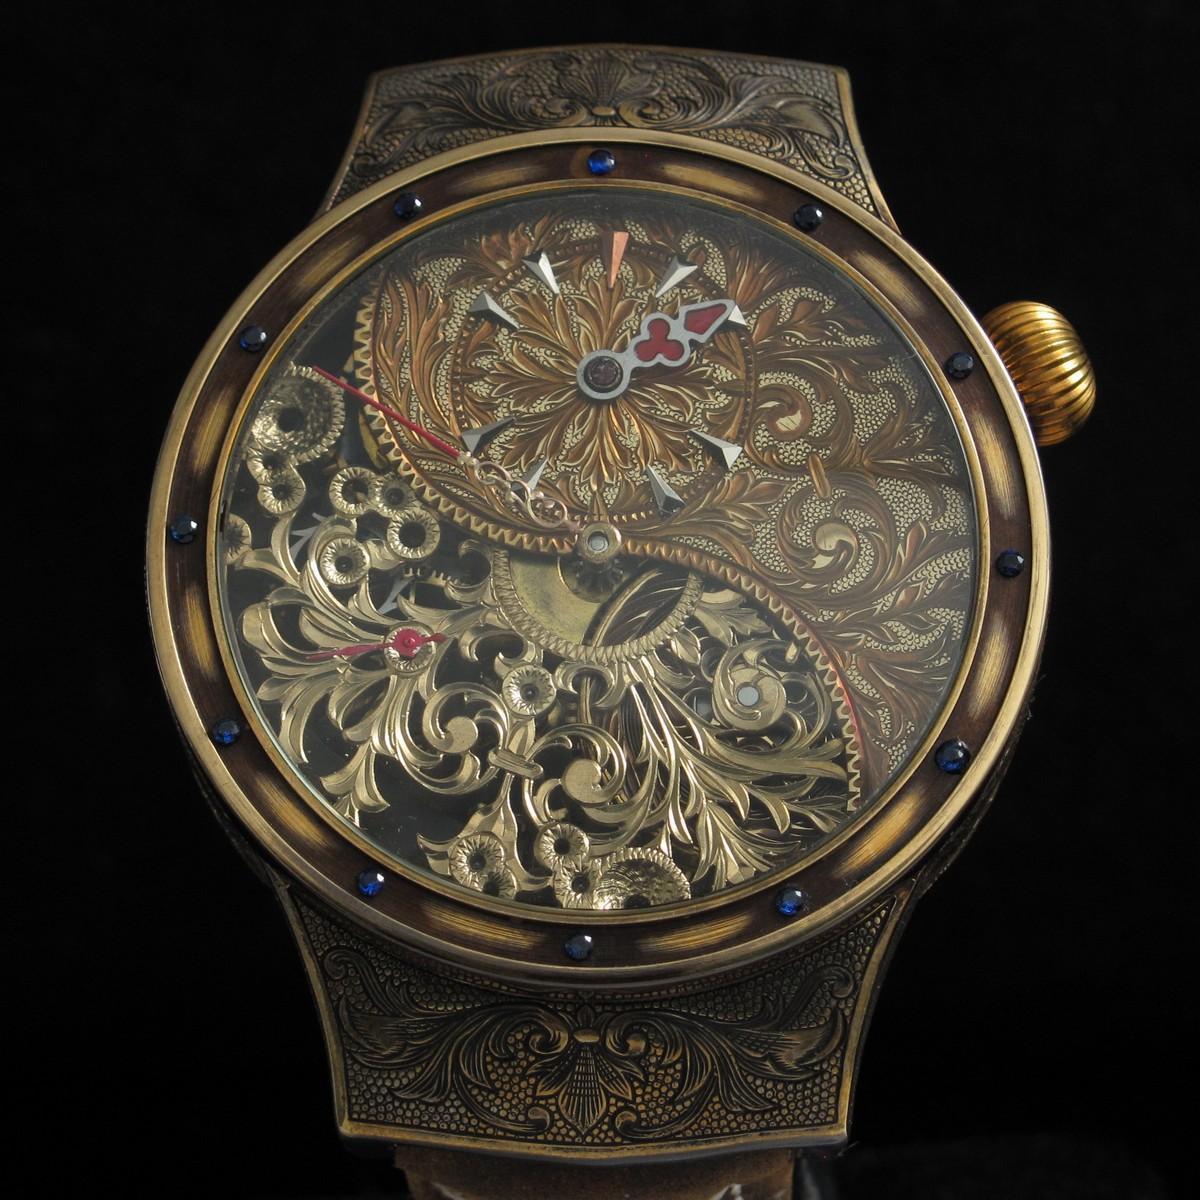 Mens Wrist Watch Catalog : OMEGA Vintage Mens Wristwatch Gold Regulateur Mechanical Half Skeleton Men's Wrist Watch Swiss